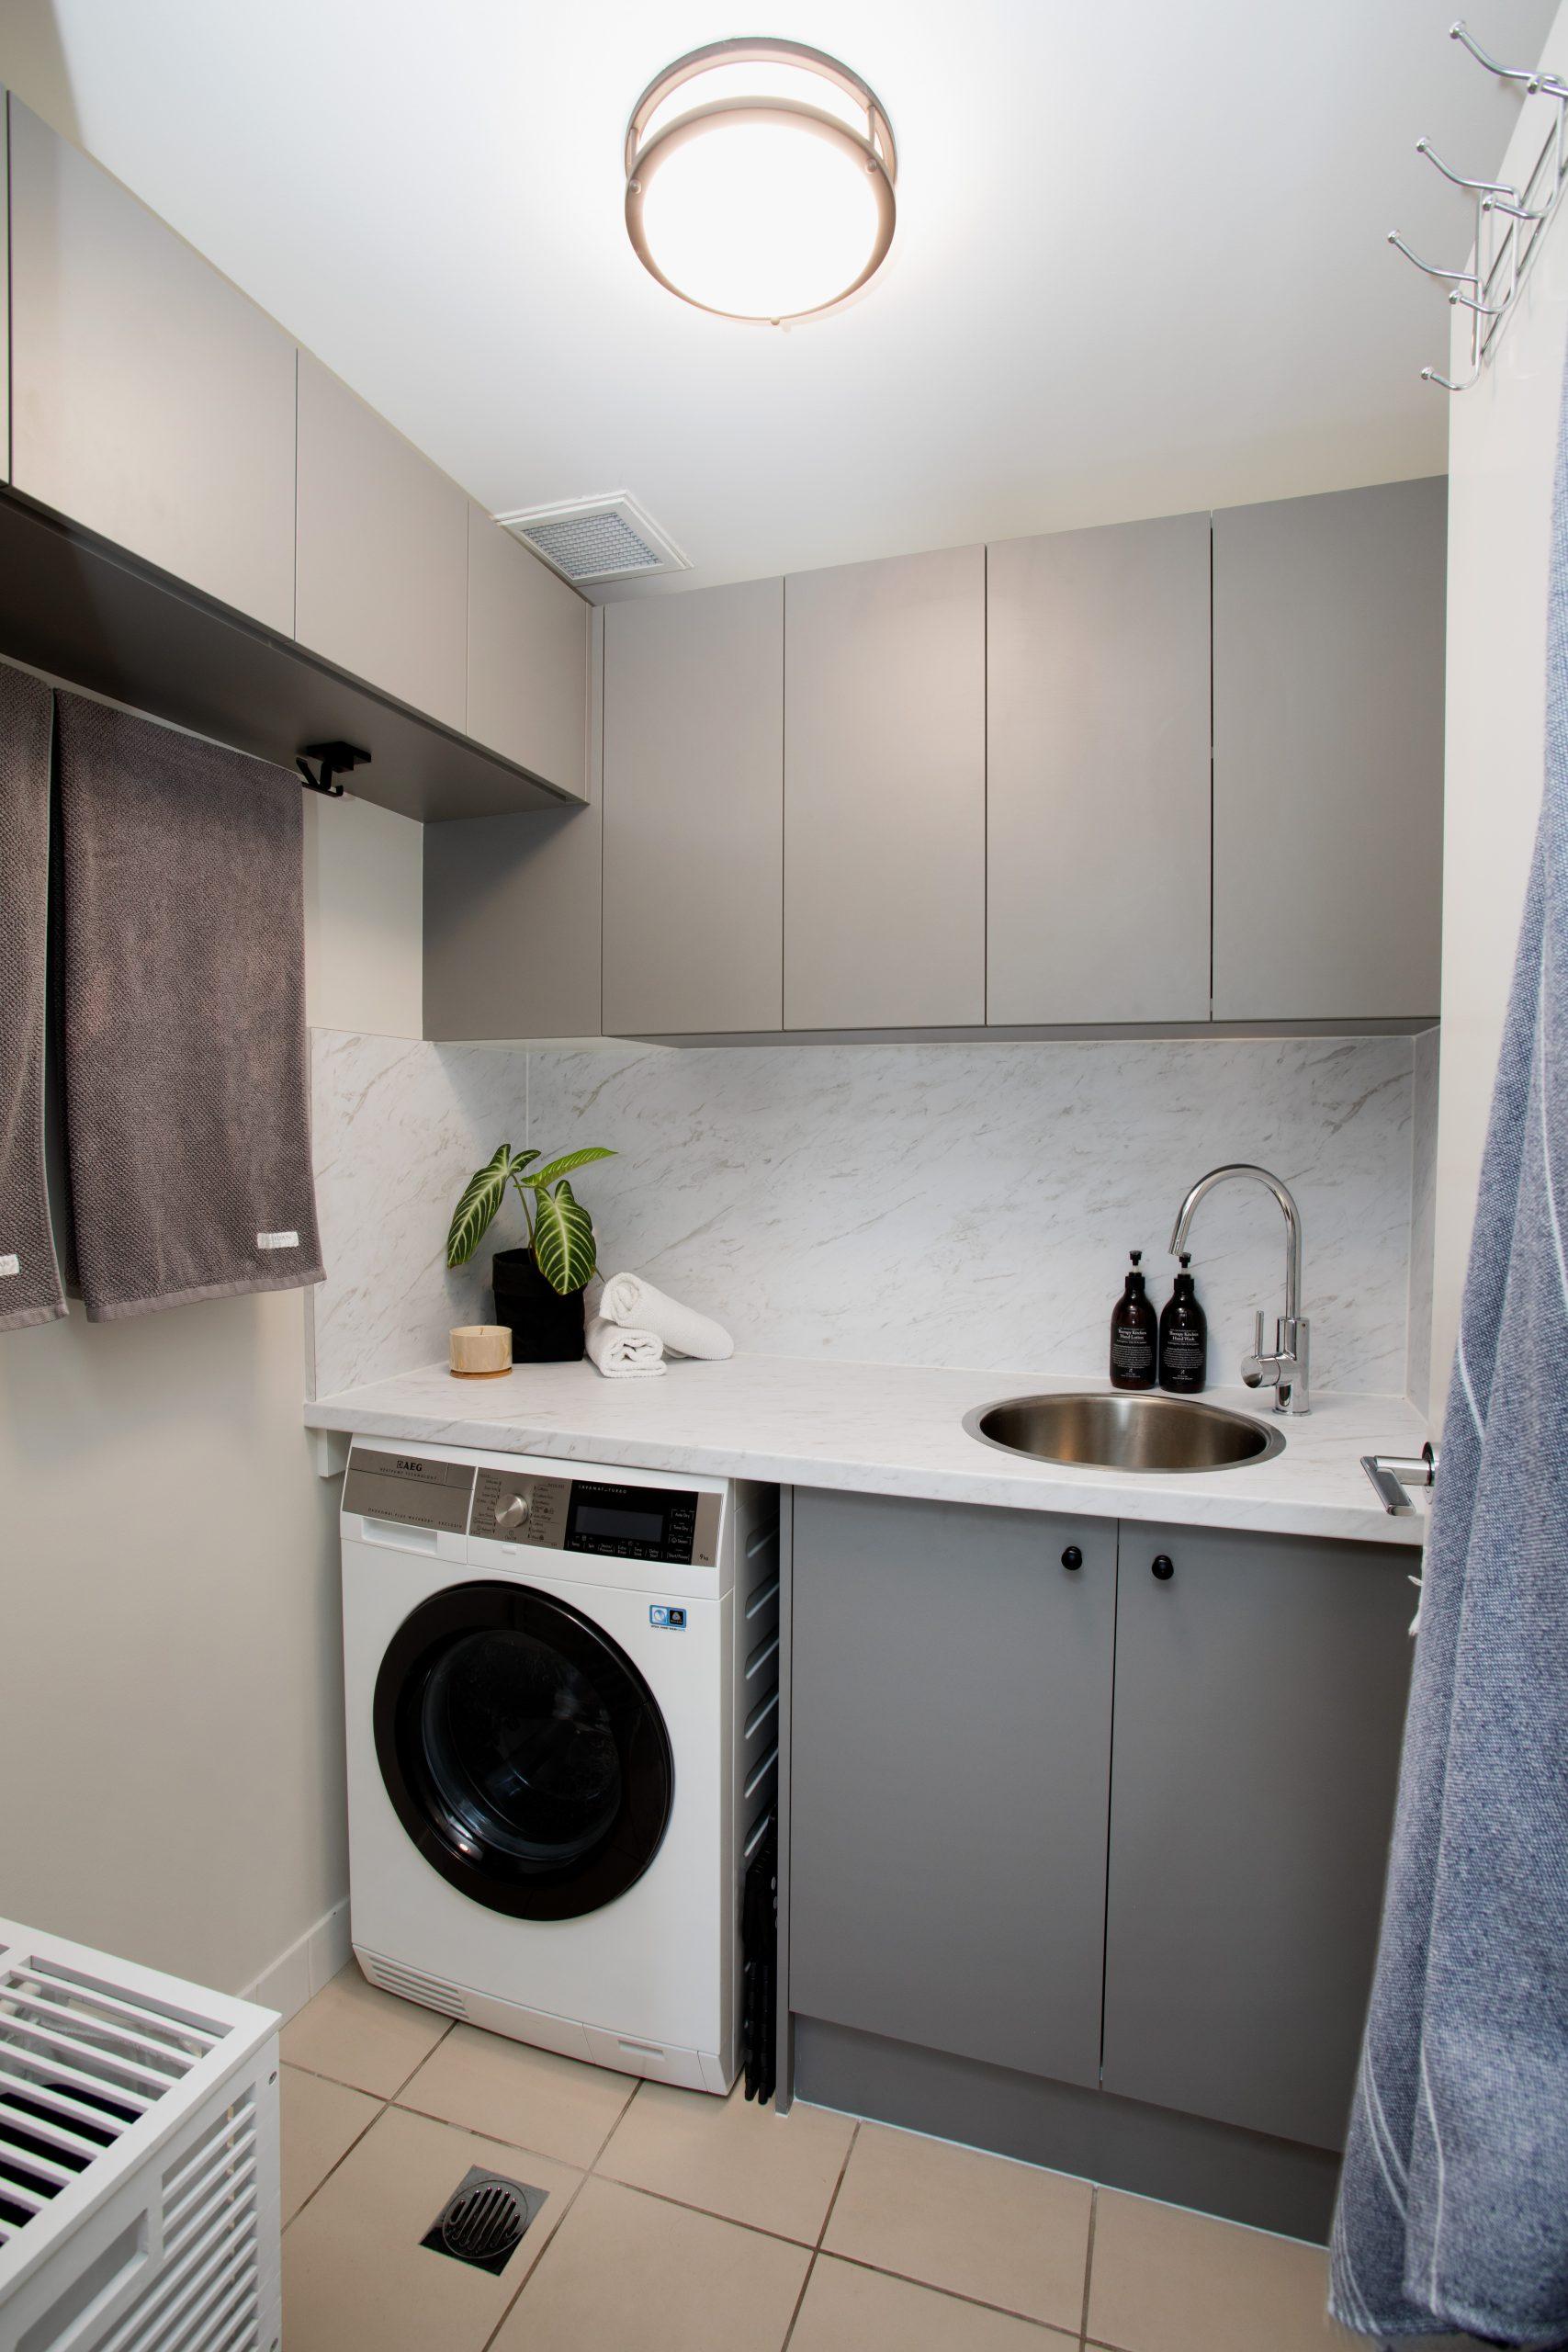 https://www.ivyandfinch.com.au/wp-content/uploads/2021/02/Roma-Street-Parklands-Interior-Design-Laundry-Renovation-scaled.jpg